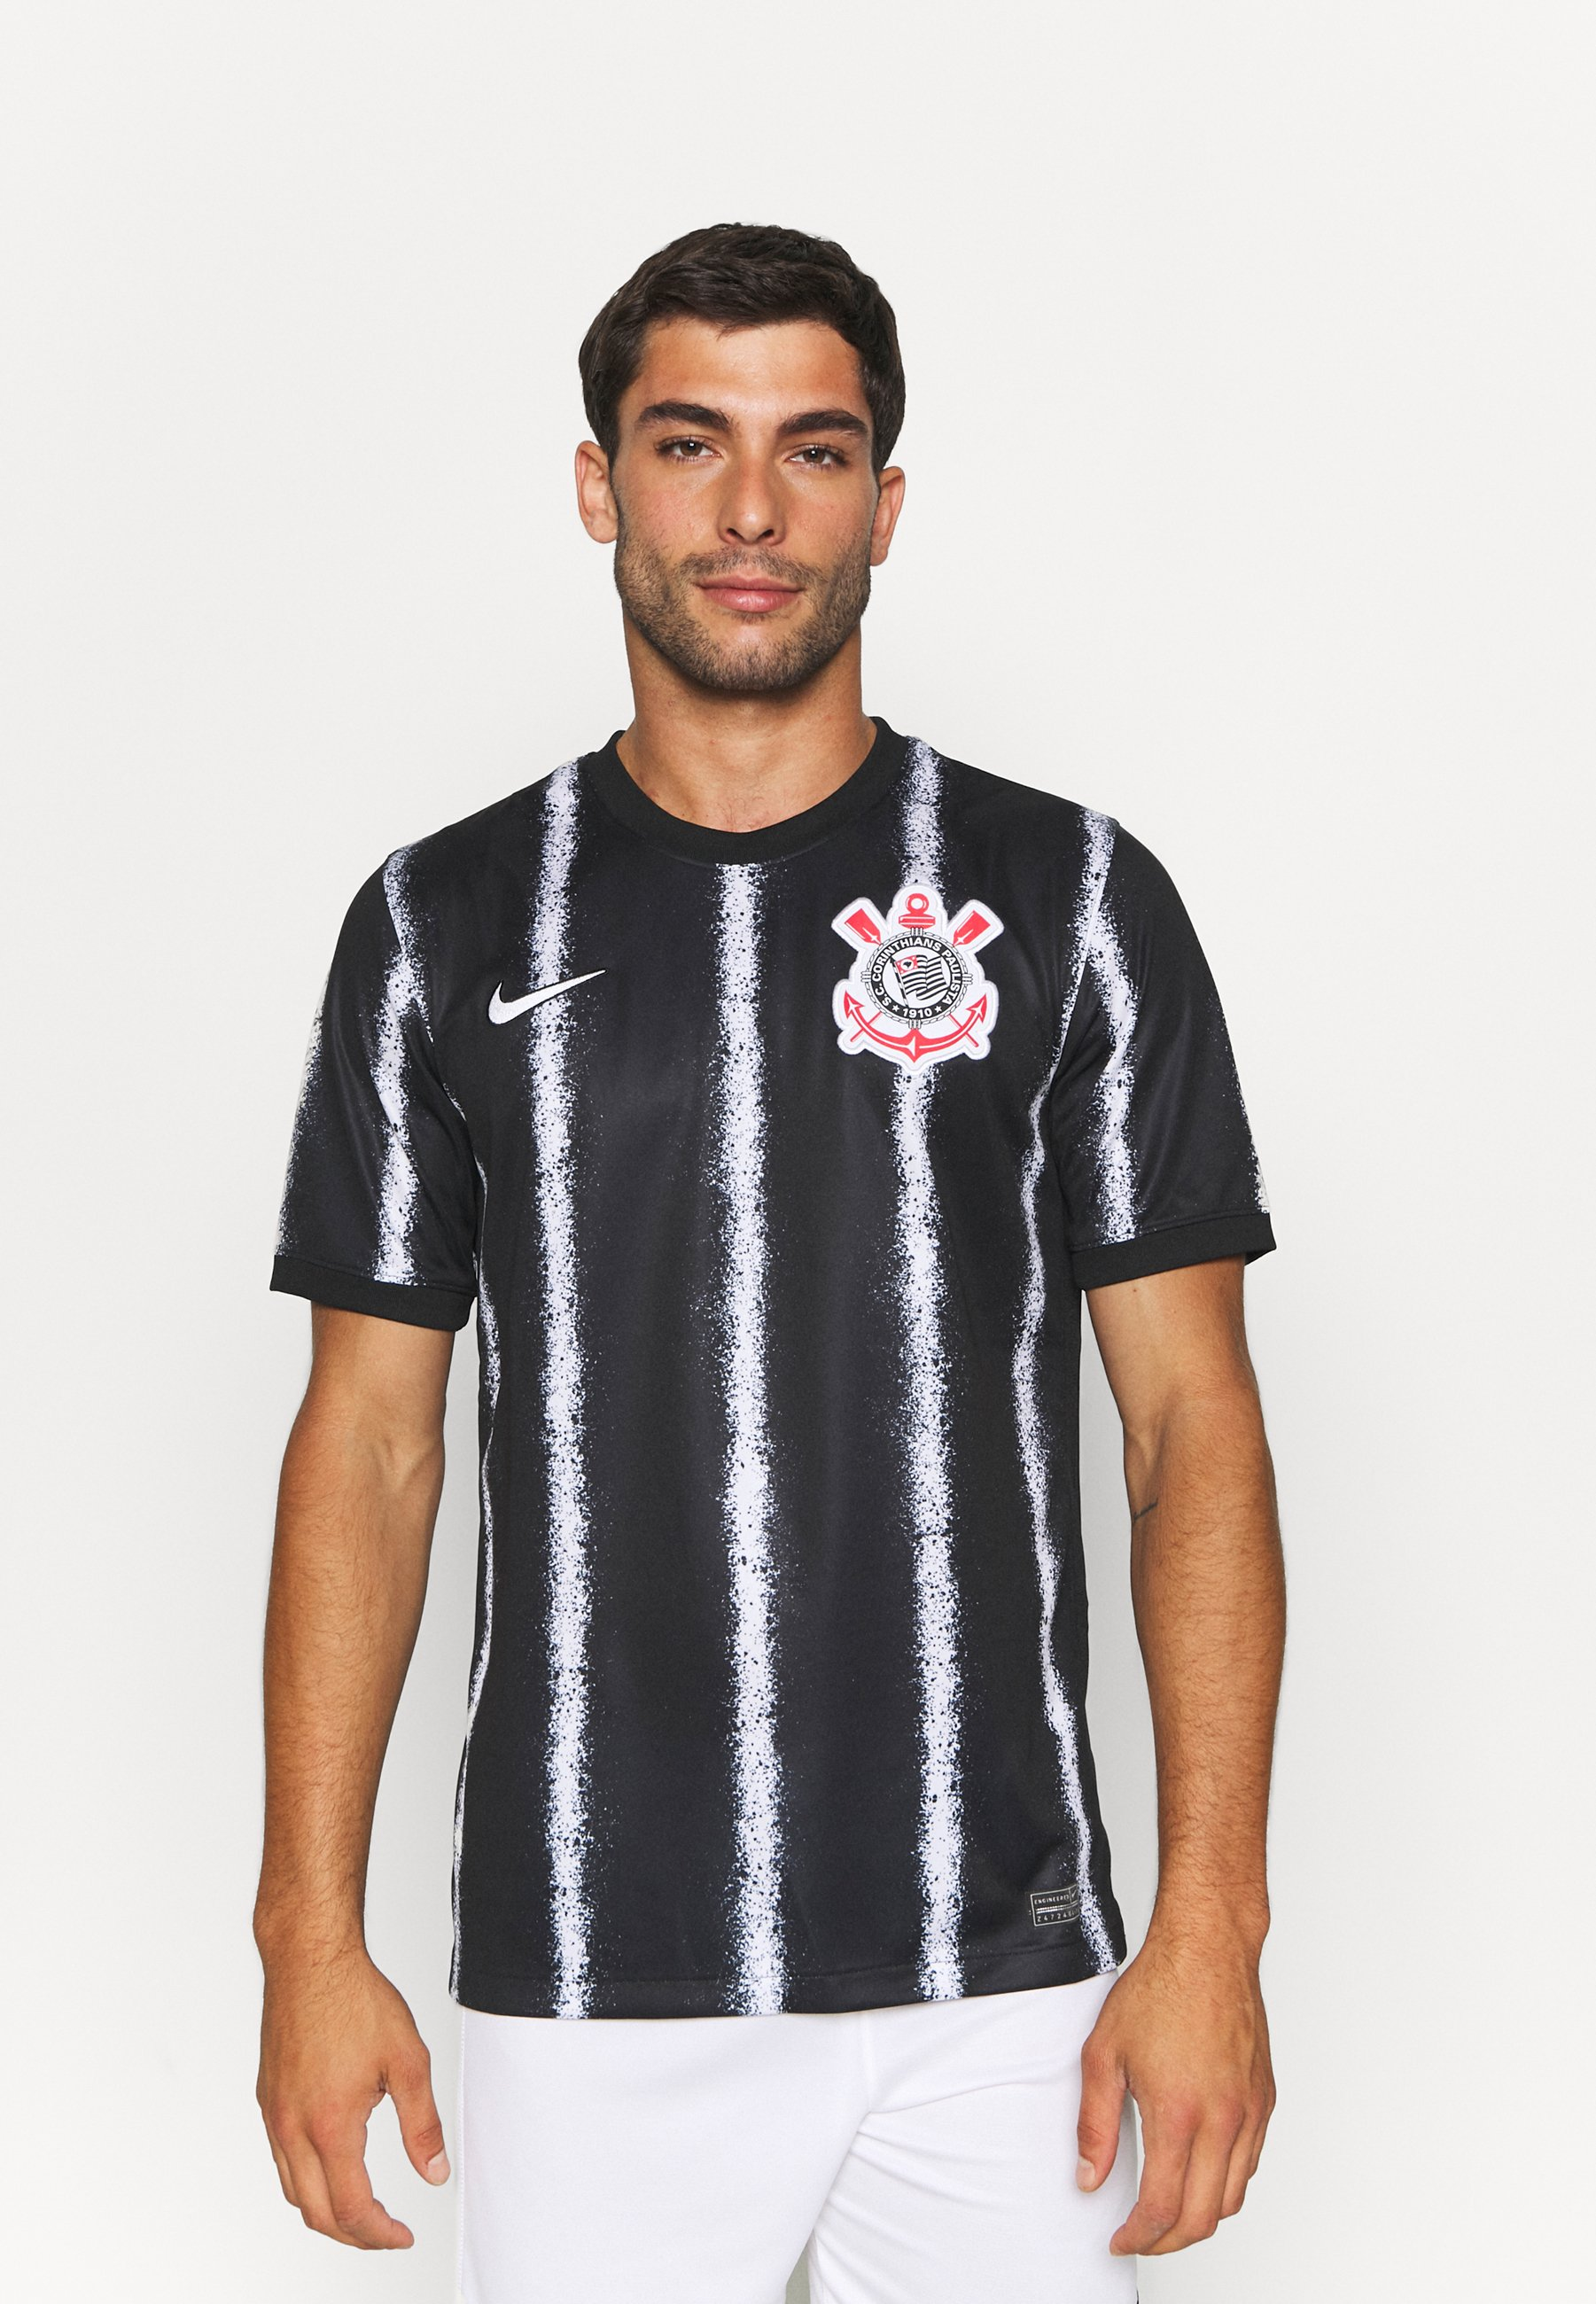 Men CORINTHIANS SAO PAOLO  - Club wear